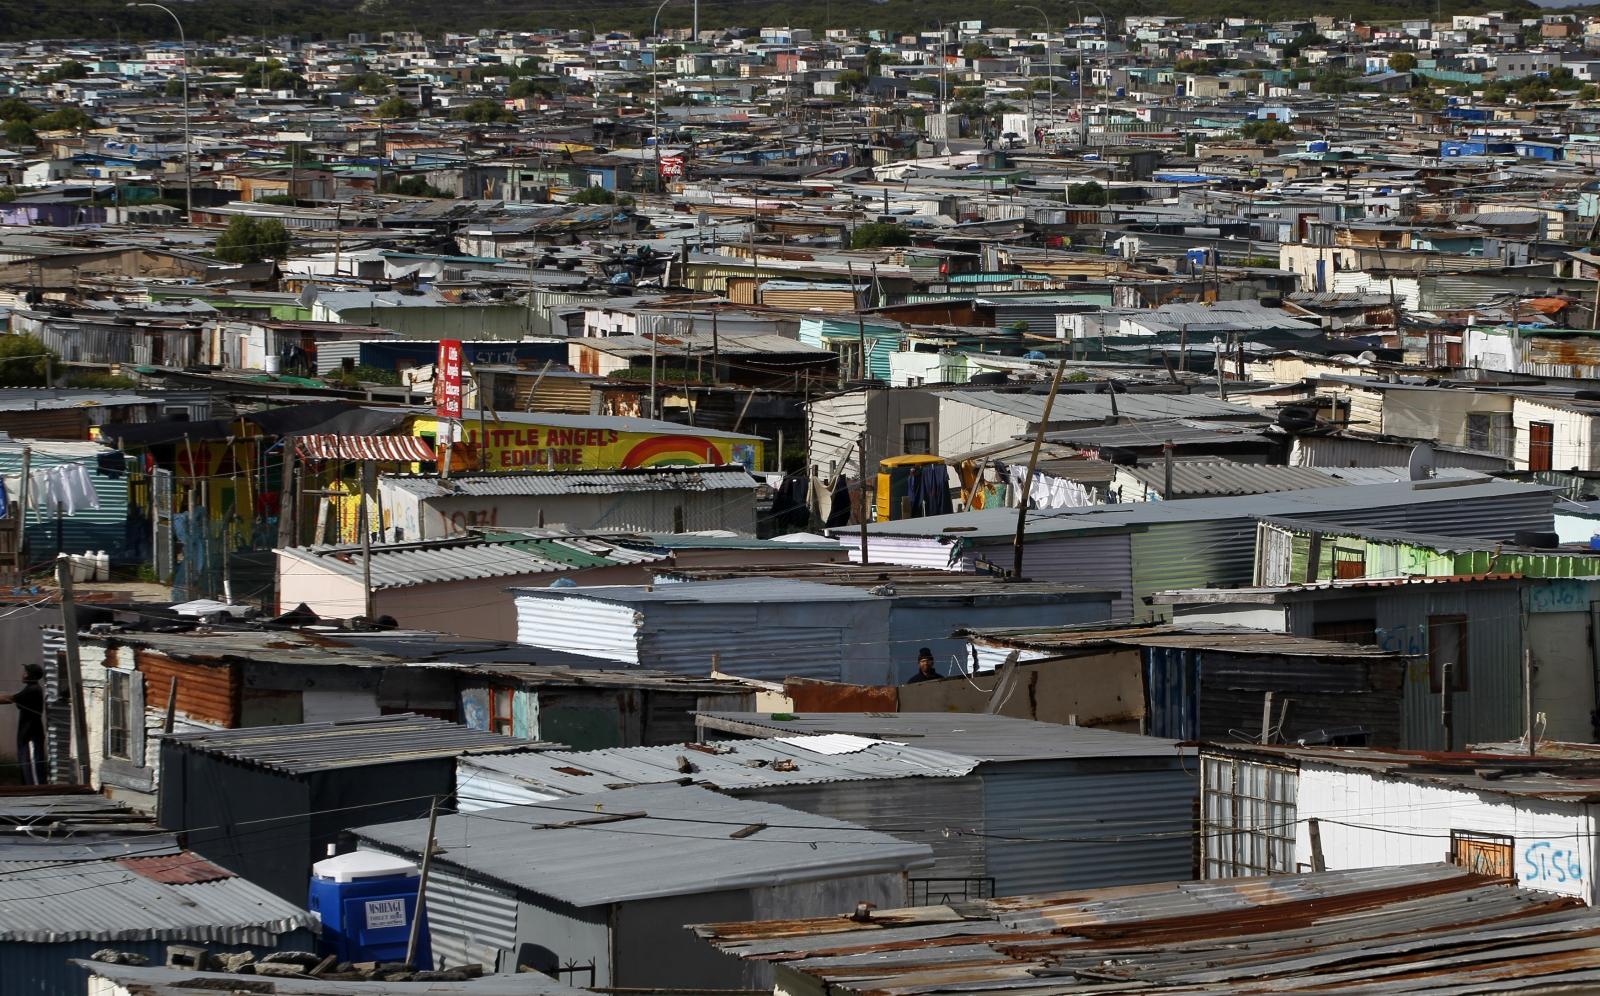 Cape Town\'s crime-ridden Khayelitsha township